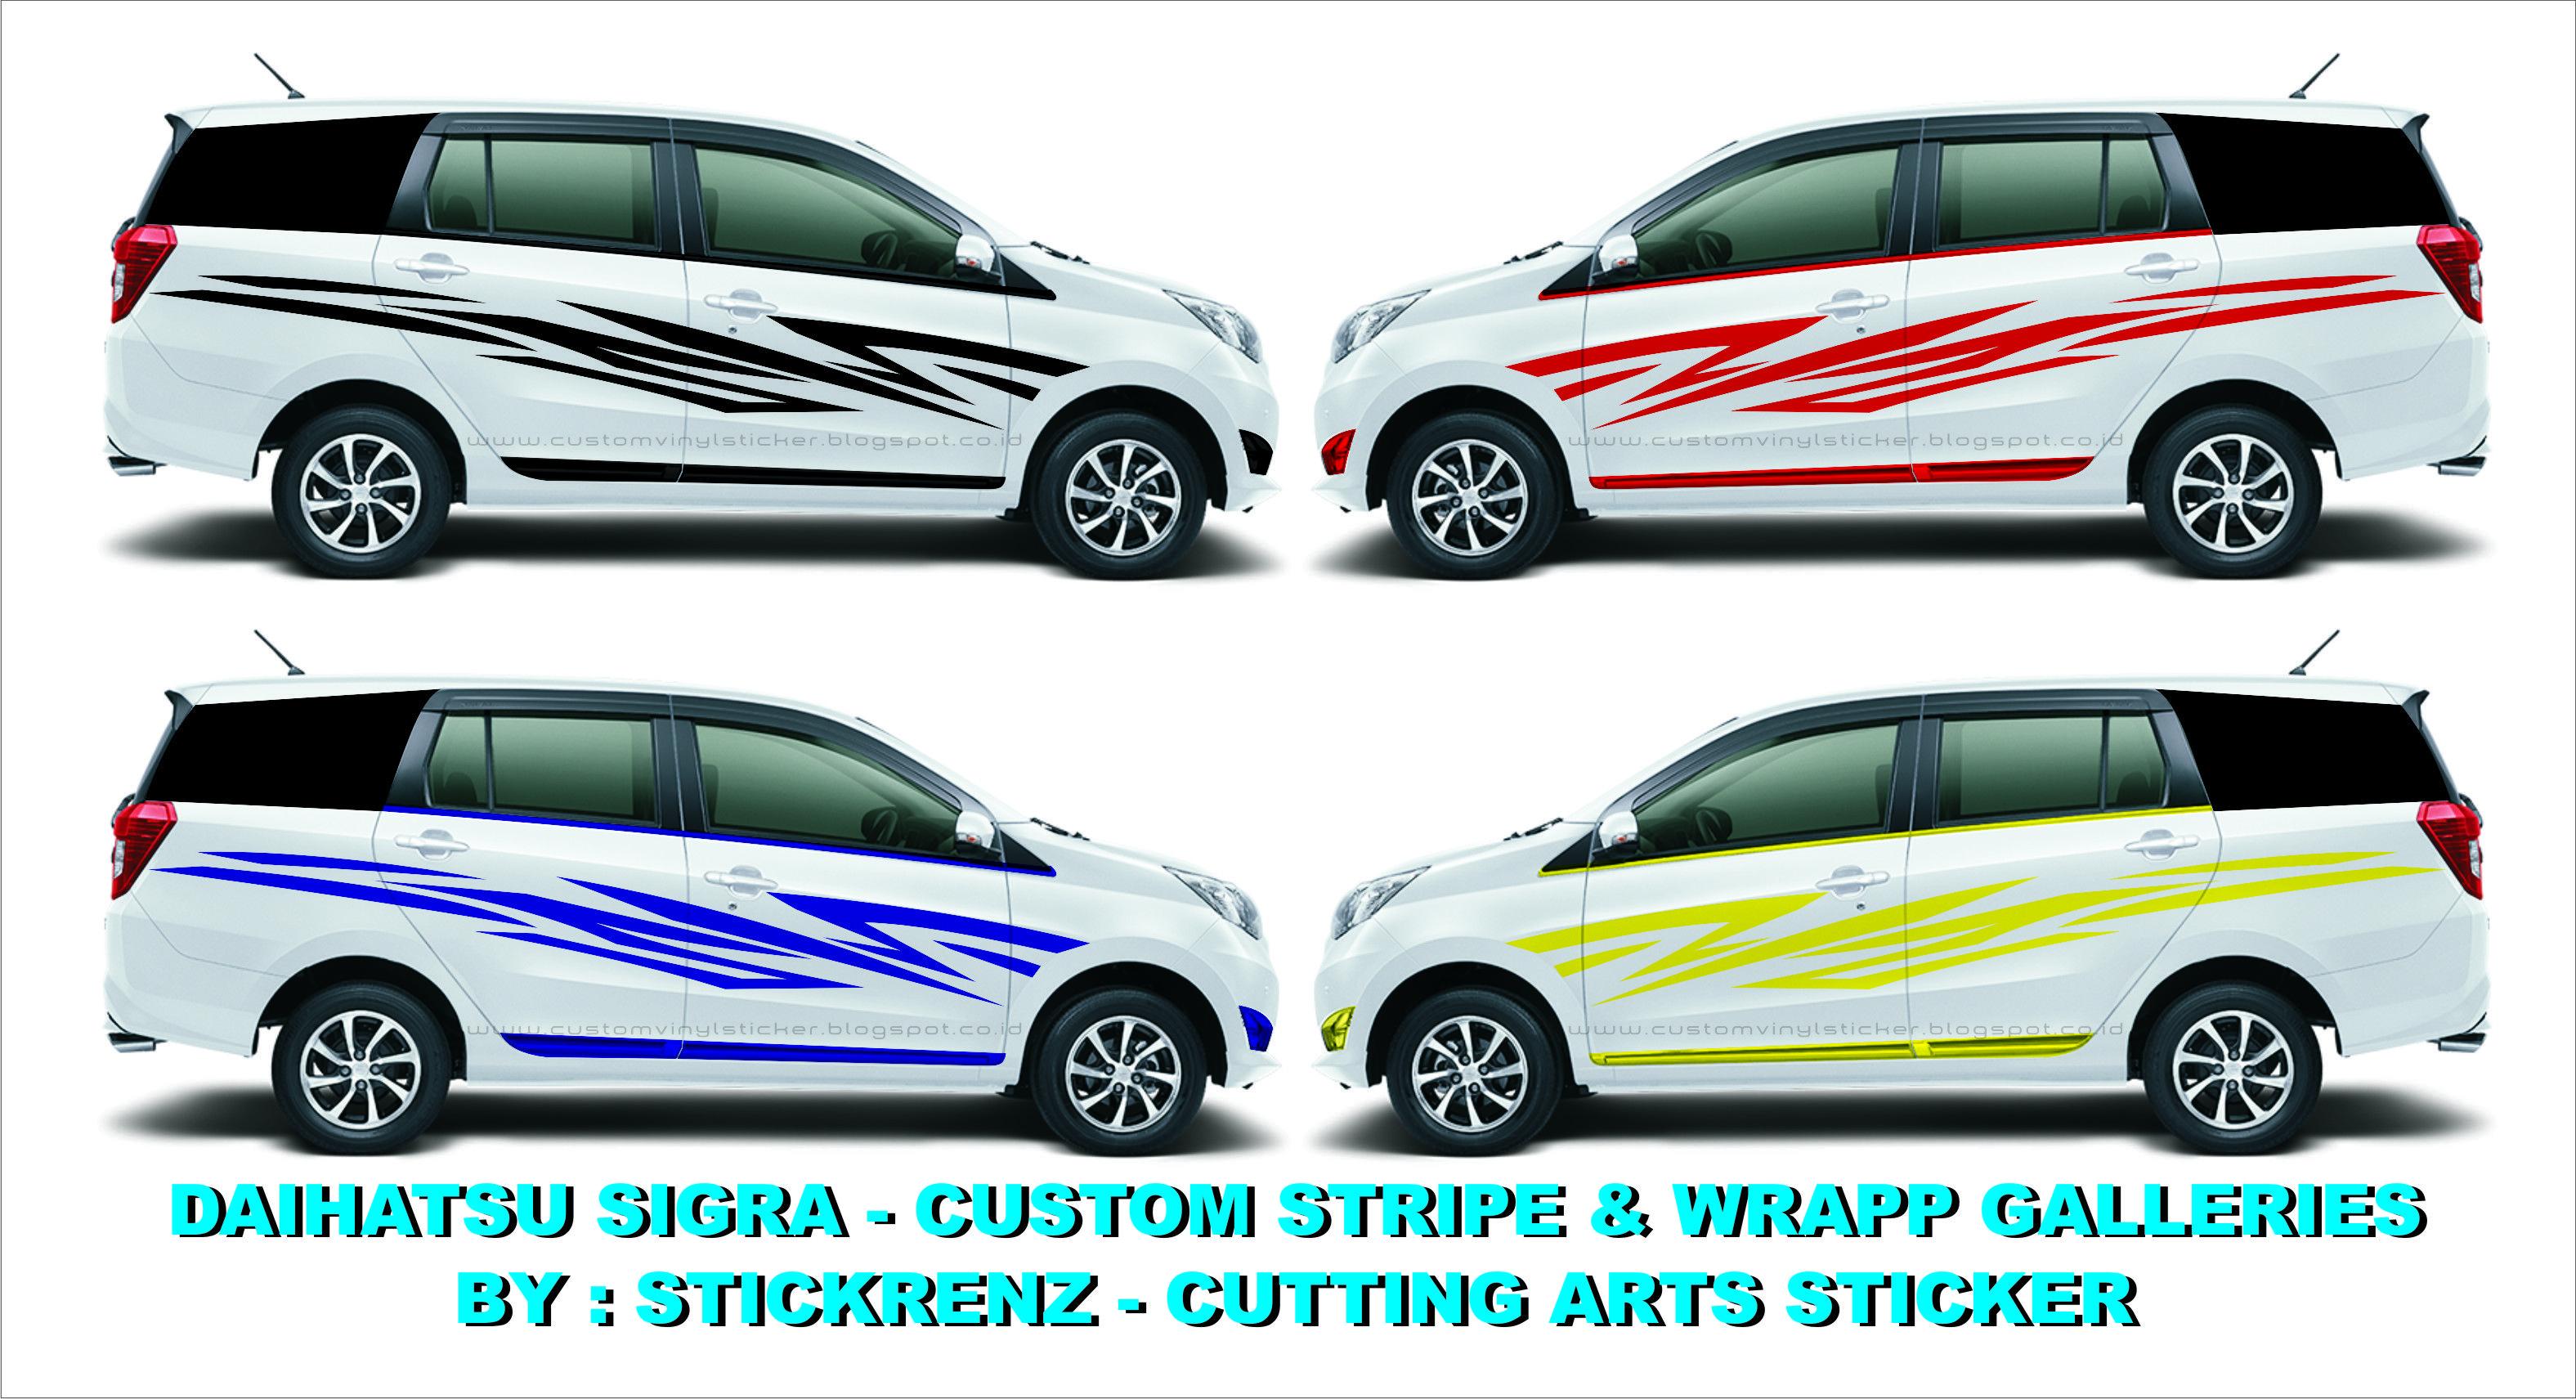 Daihatsu Sigra Custom Stripe Wrapp Concept Galleries 002